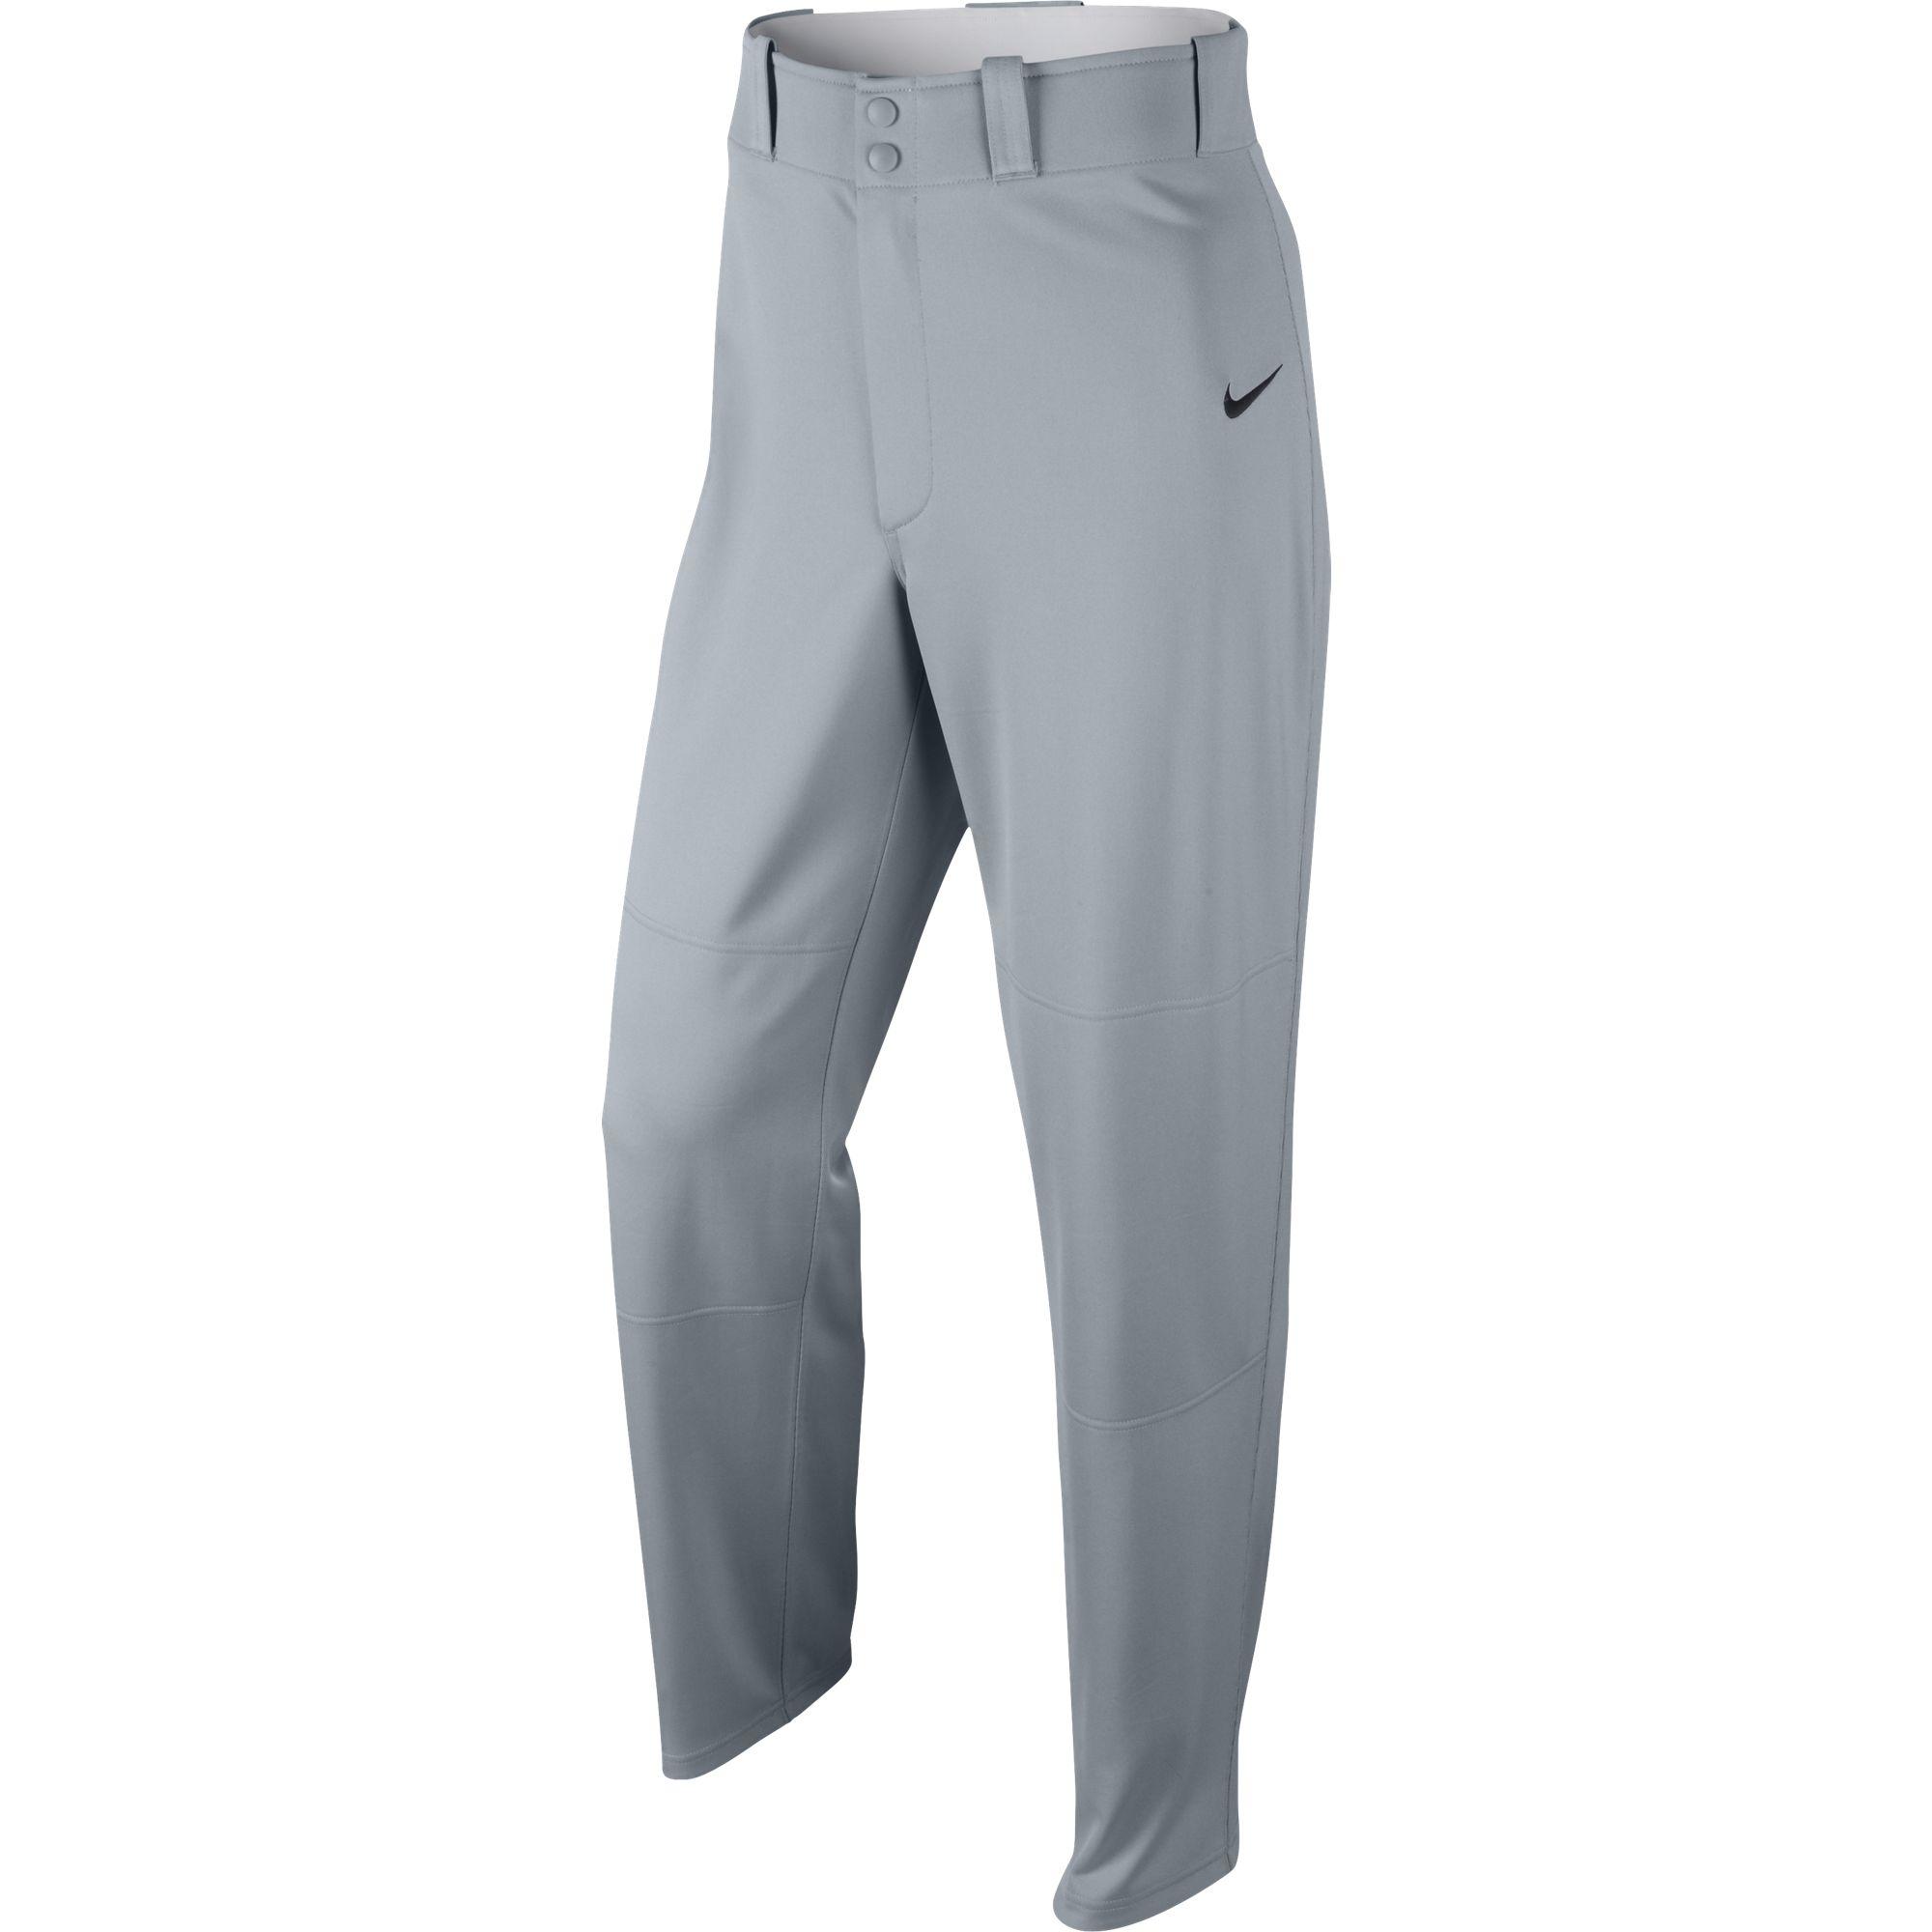 Men's  Core DF Open Bottom Baseball Pants, Gray, swatch